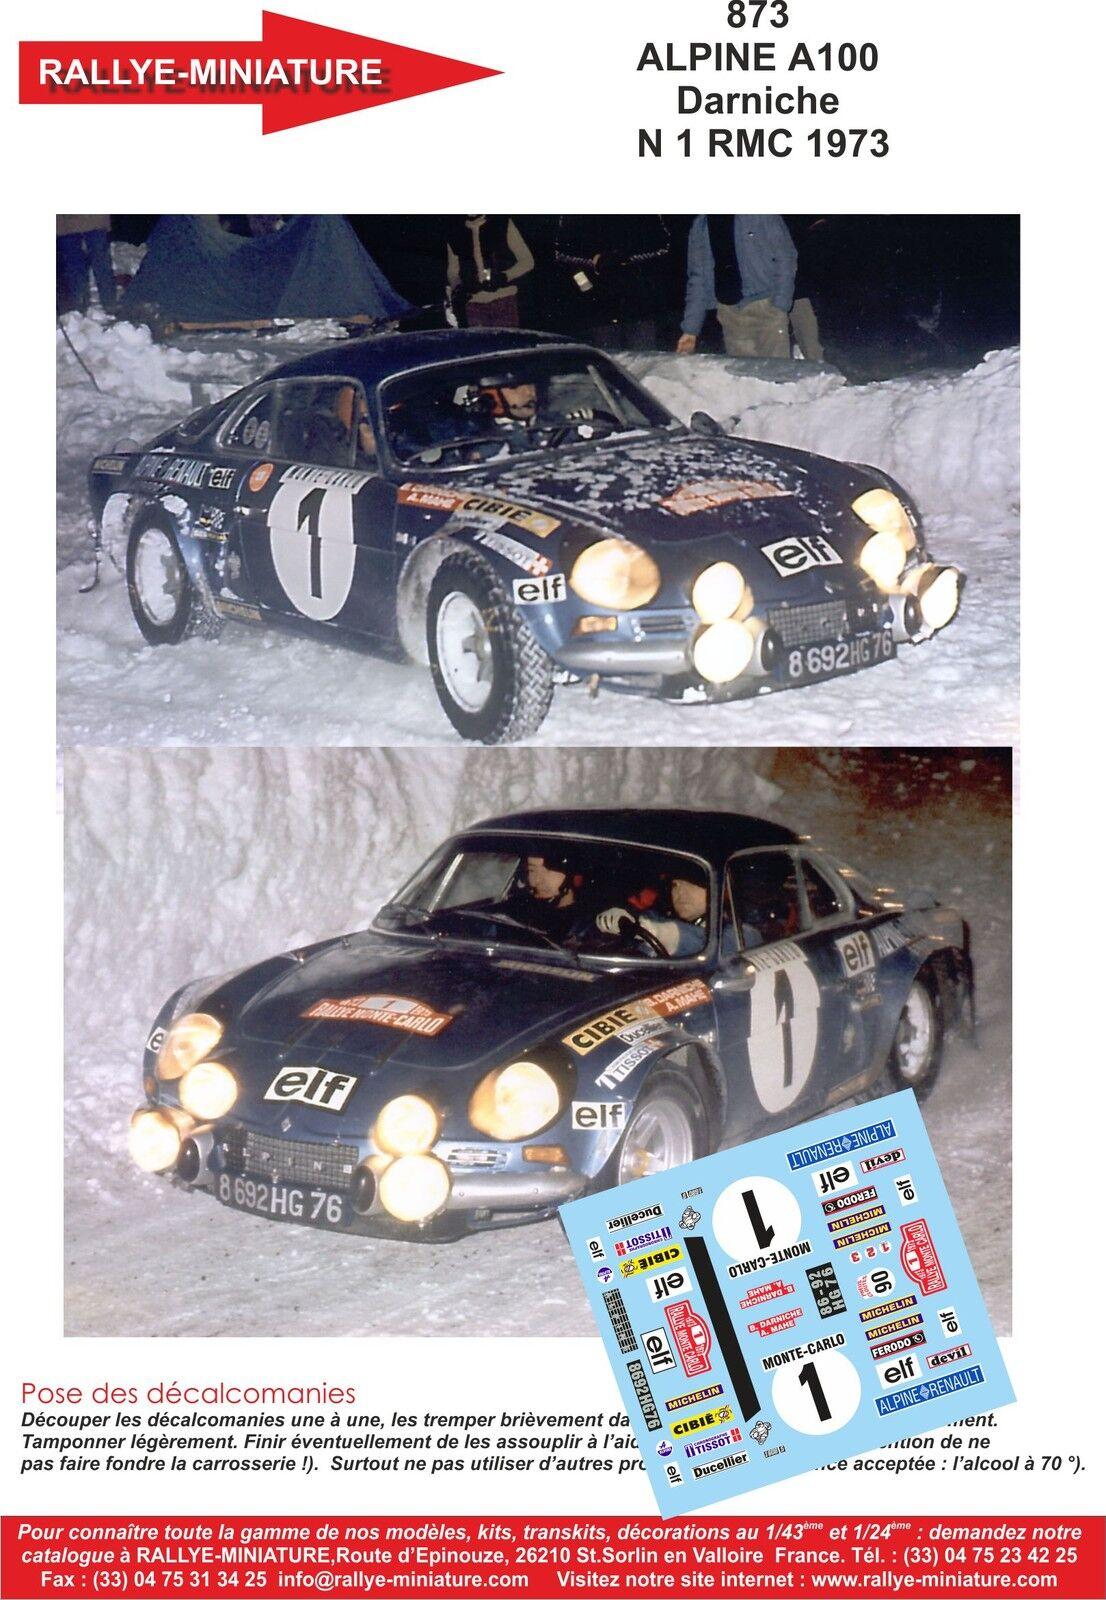 DECALS 1 18 REF 873 ALPINE RENAULT A110 DARNICHE RALLYE MONTE CARLO 1973 RALLY